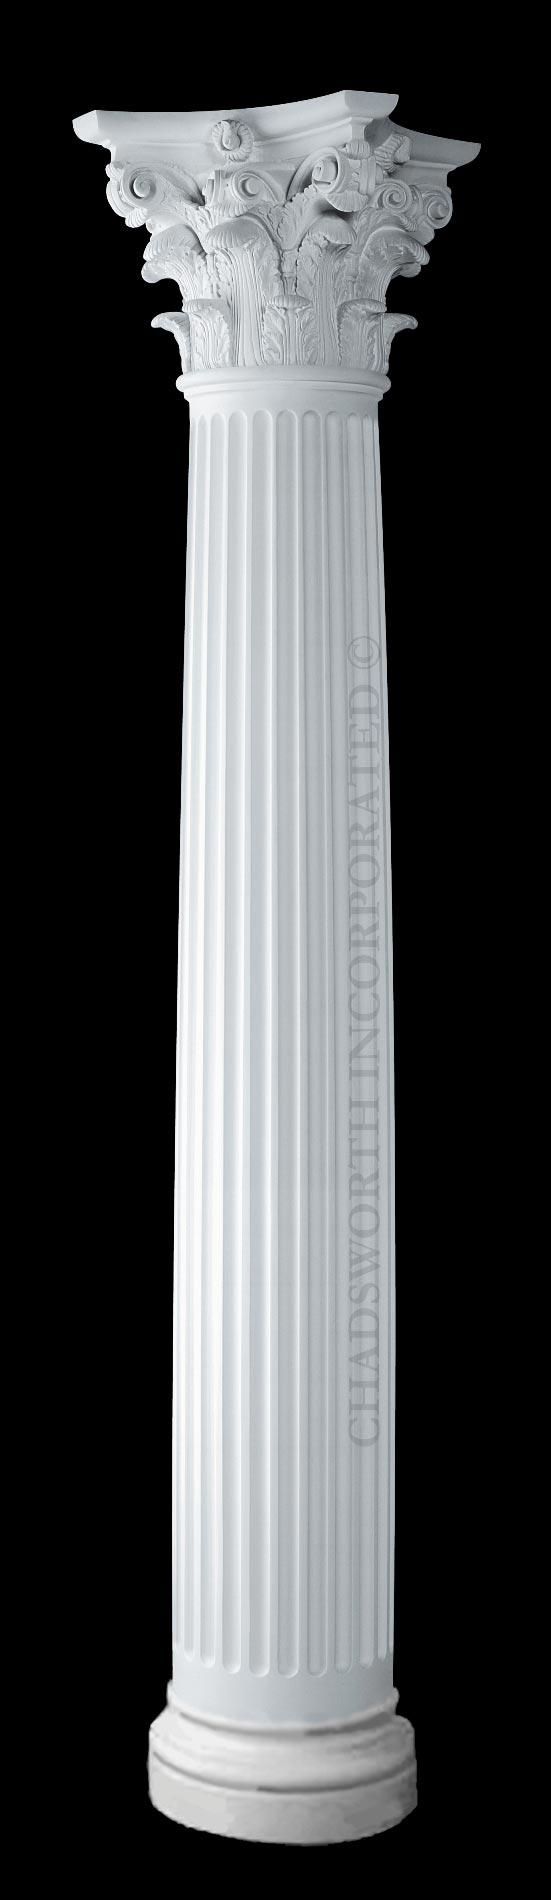 Design 635 Rb Corinthian Order Roman Frp Composite